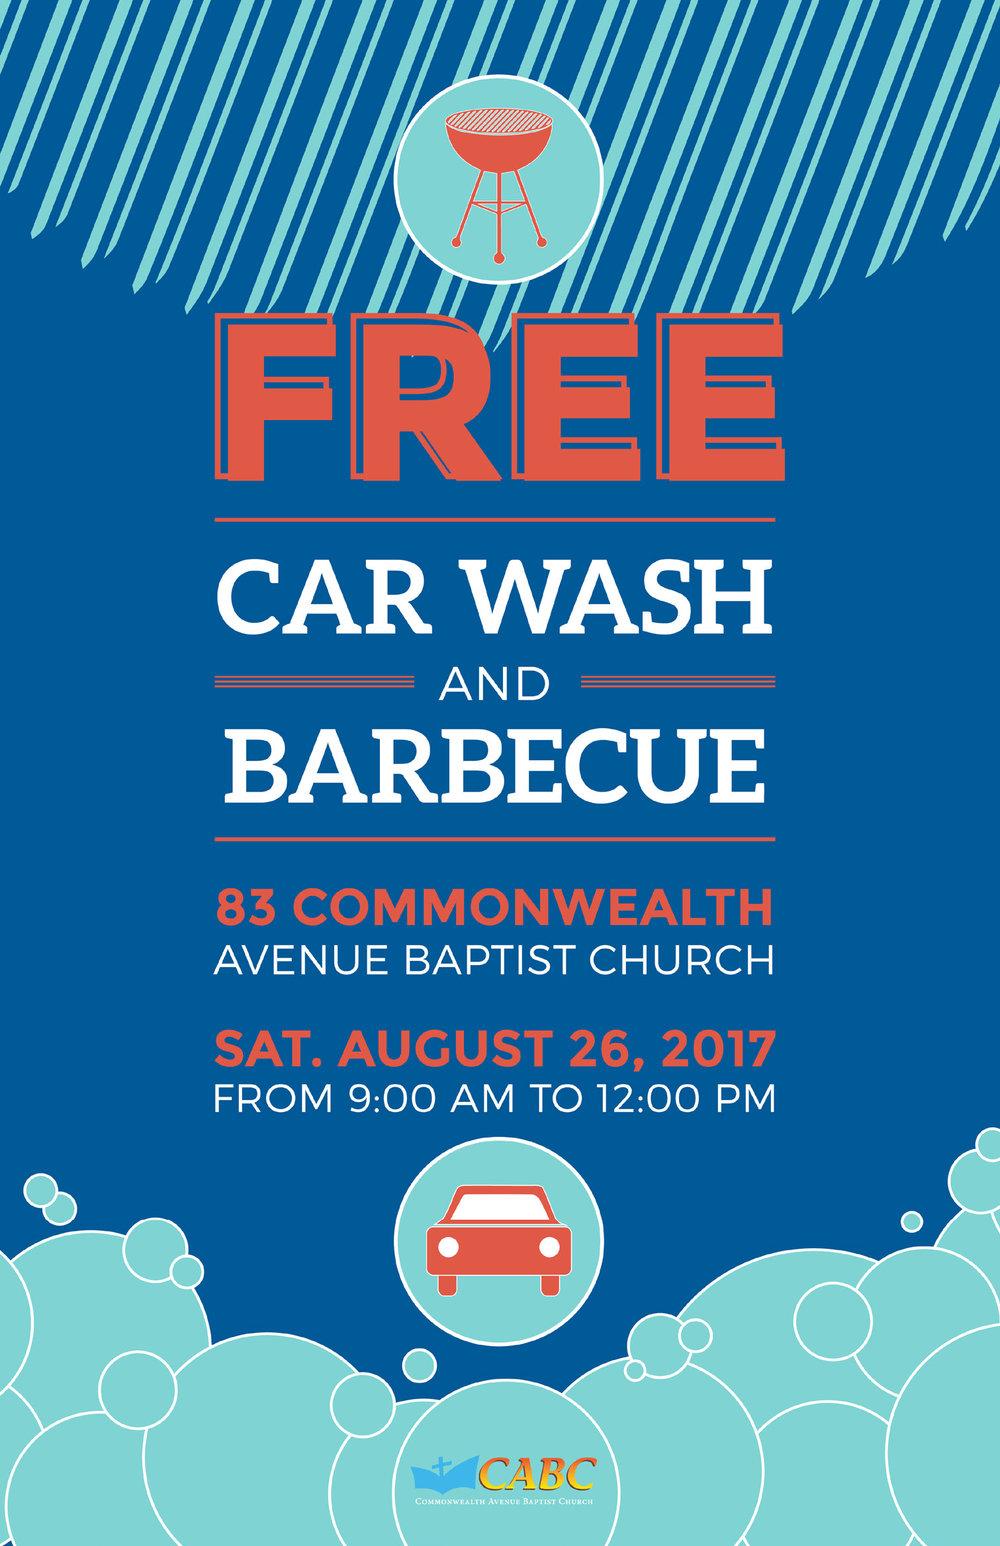 CABC-2017-free-Carwash-BBQ